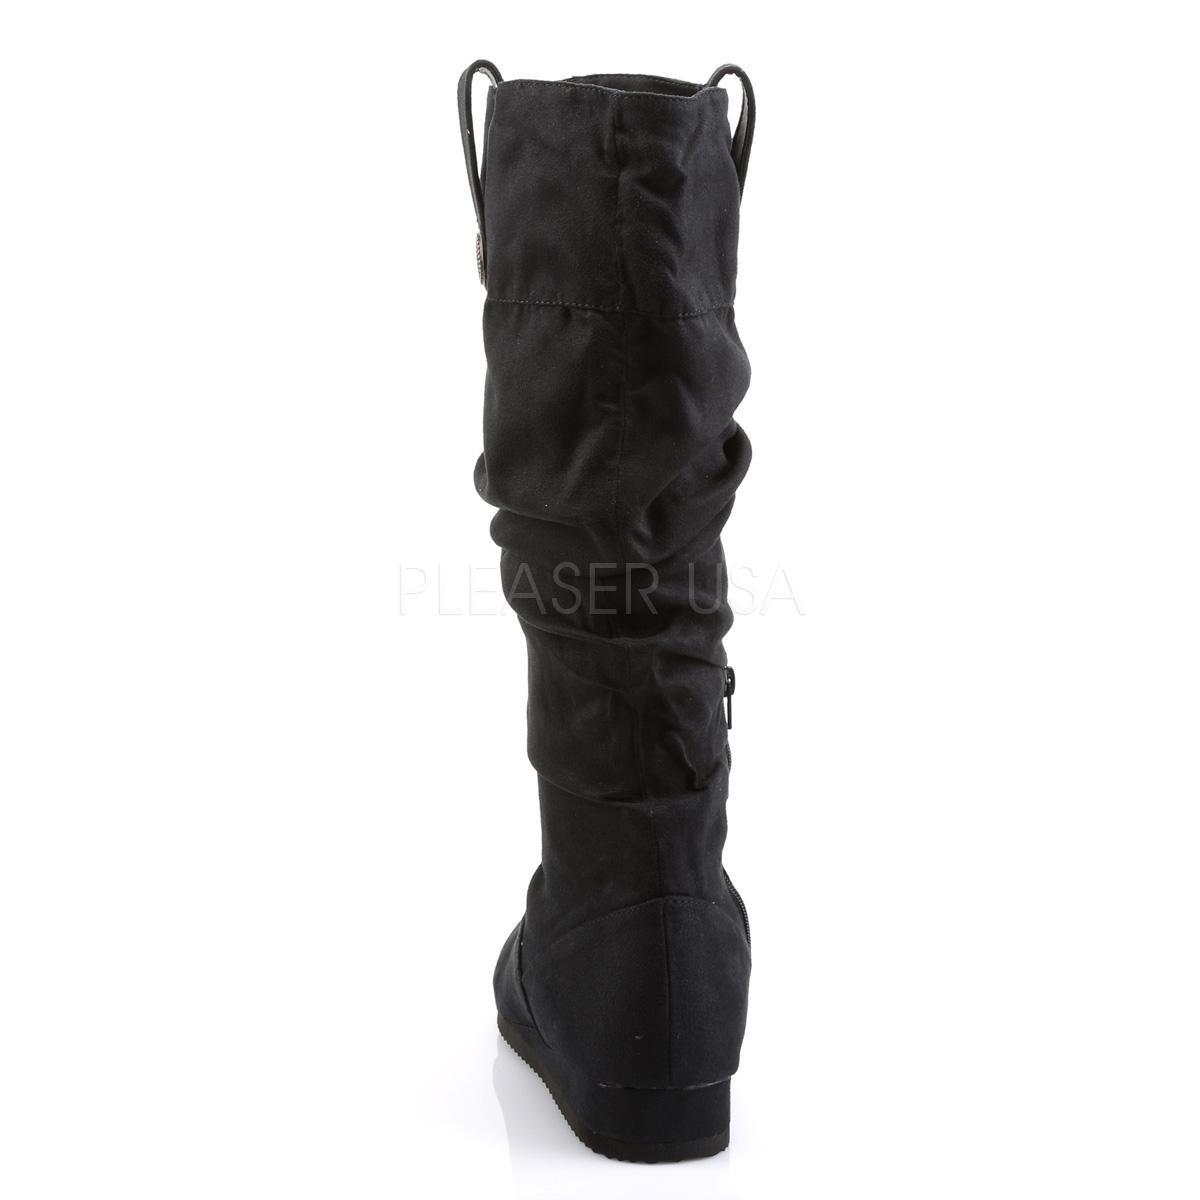 FUNTASMA RENAISSANCE-104 #Men's メンズブーツ ファー 起毛 ミドルブーツ ハーフブーツ 黒マイクロファイバー Pleaser◆取り寄せ